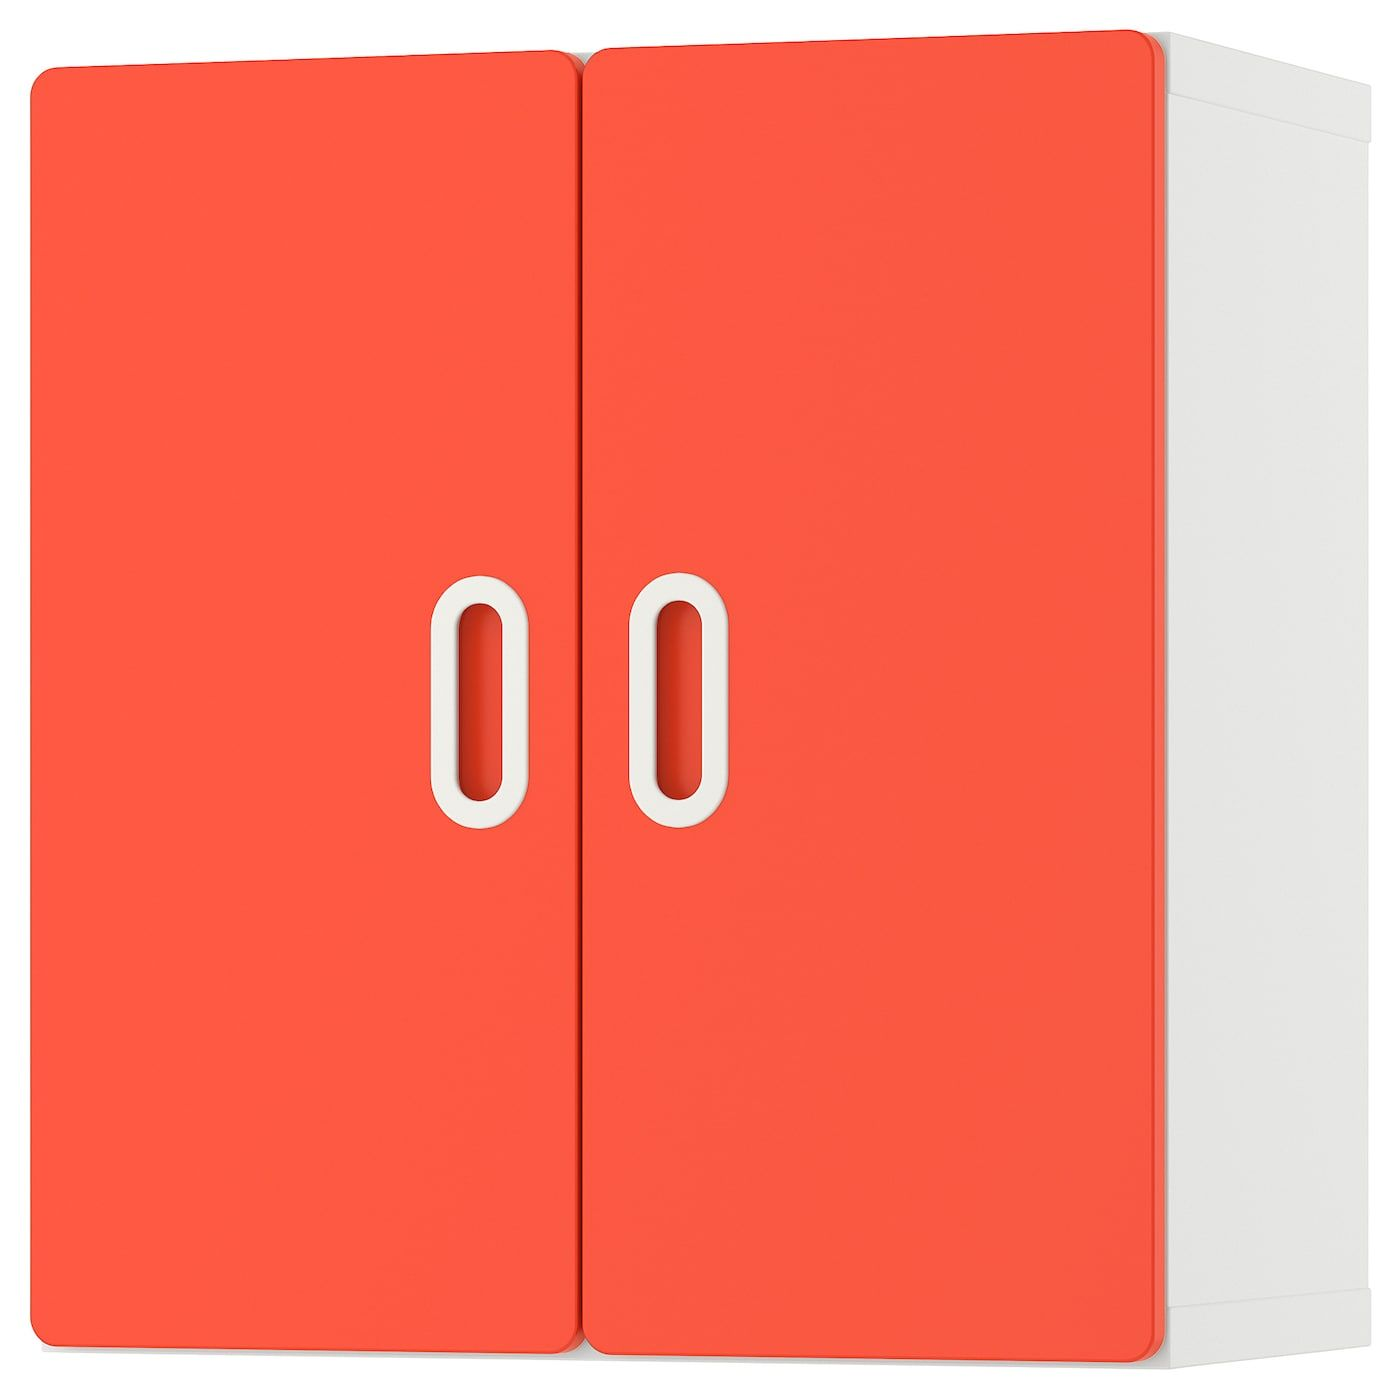 Stuva Fritids Wandschrank Weiss Rot Ikea Osterreich In 2020